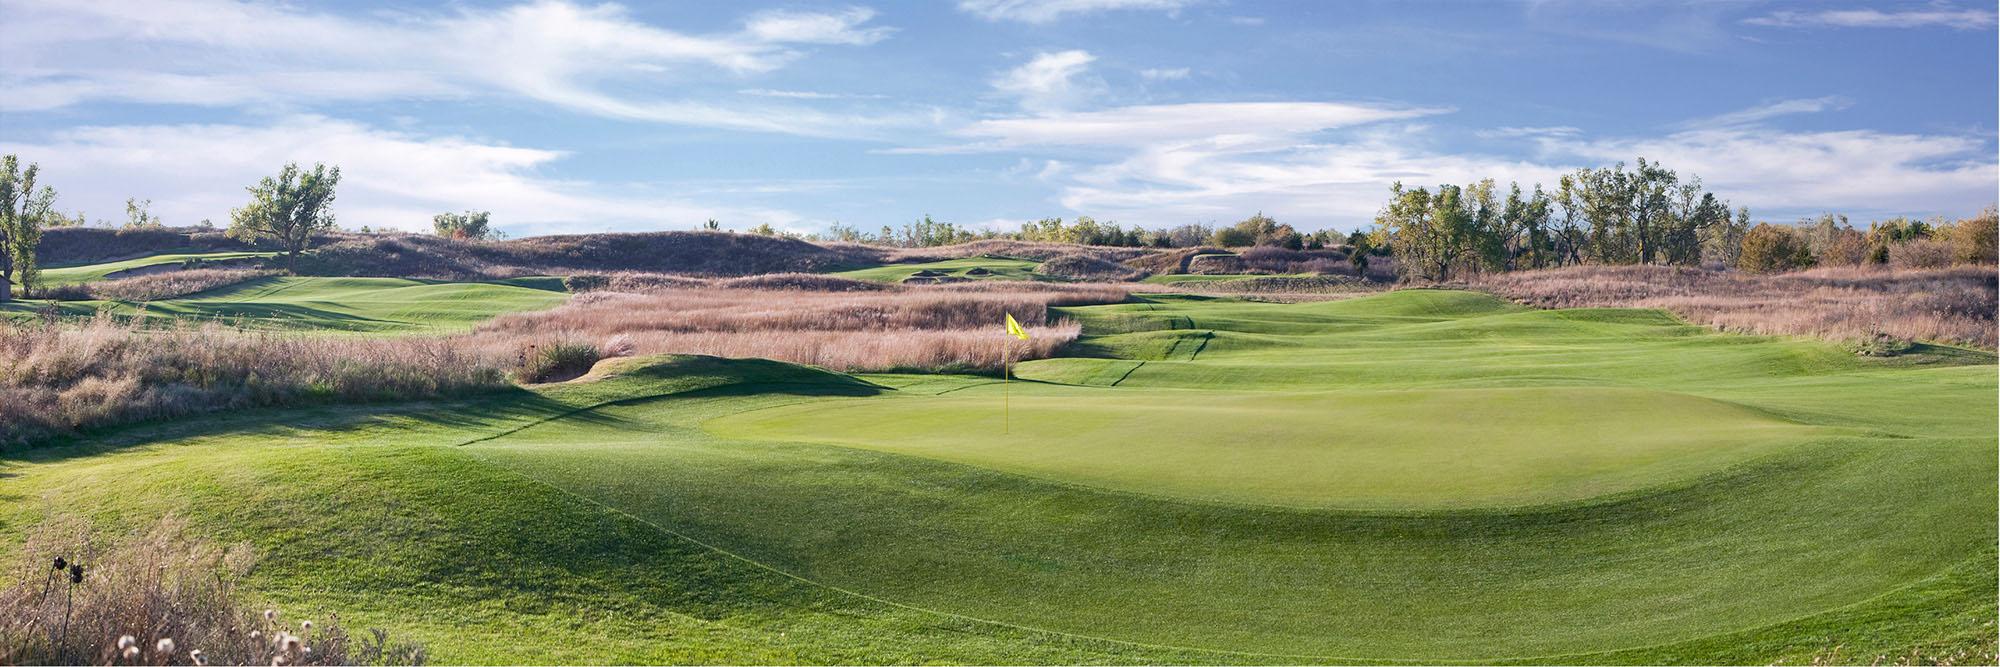 Golf Course Image - Prairie Dunes Country Club No. 9